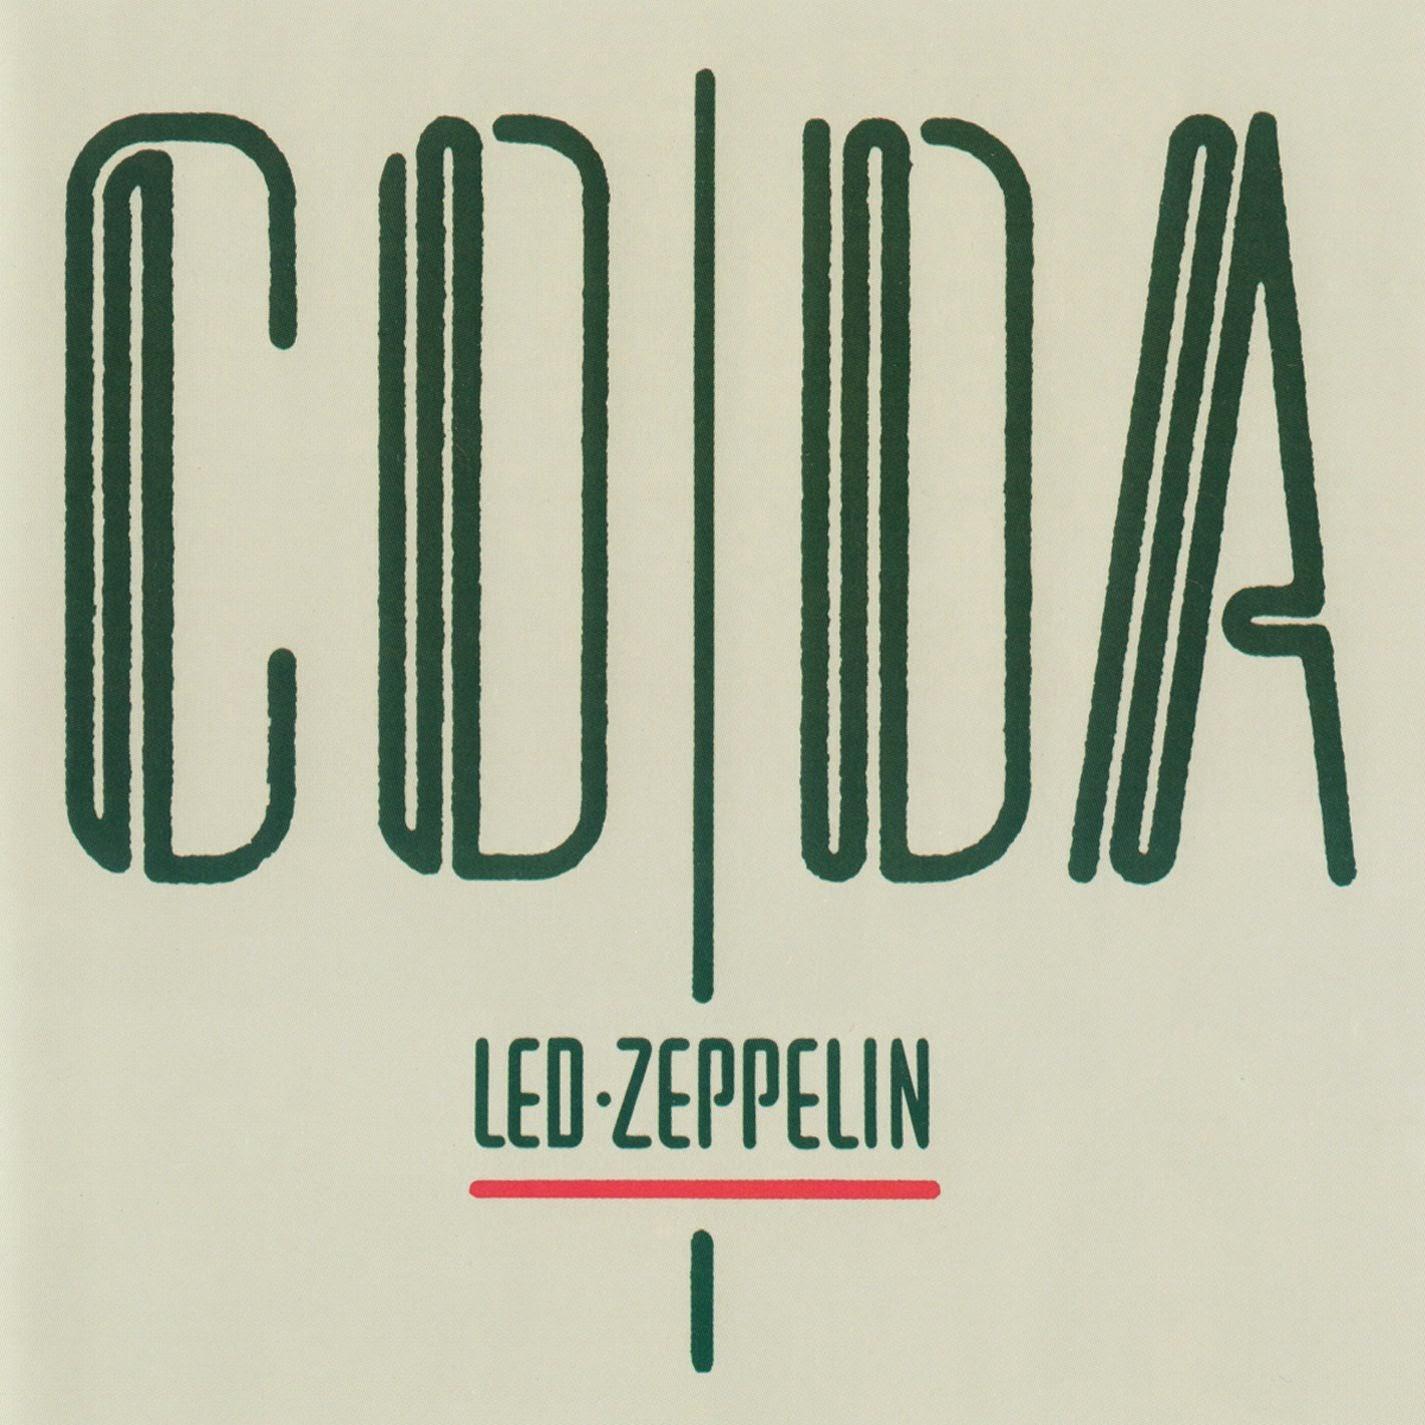 1969 - Led Zeppelin - Remastered